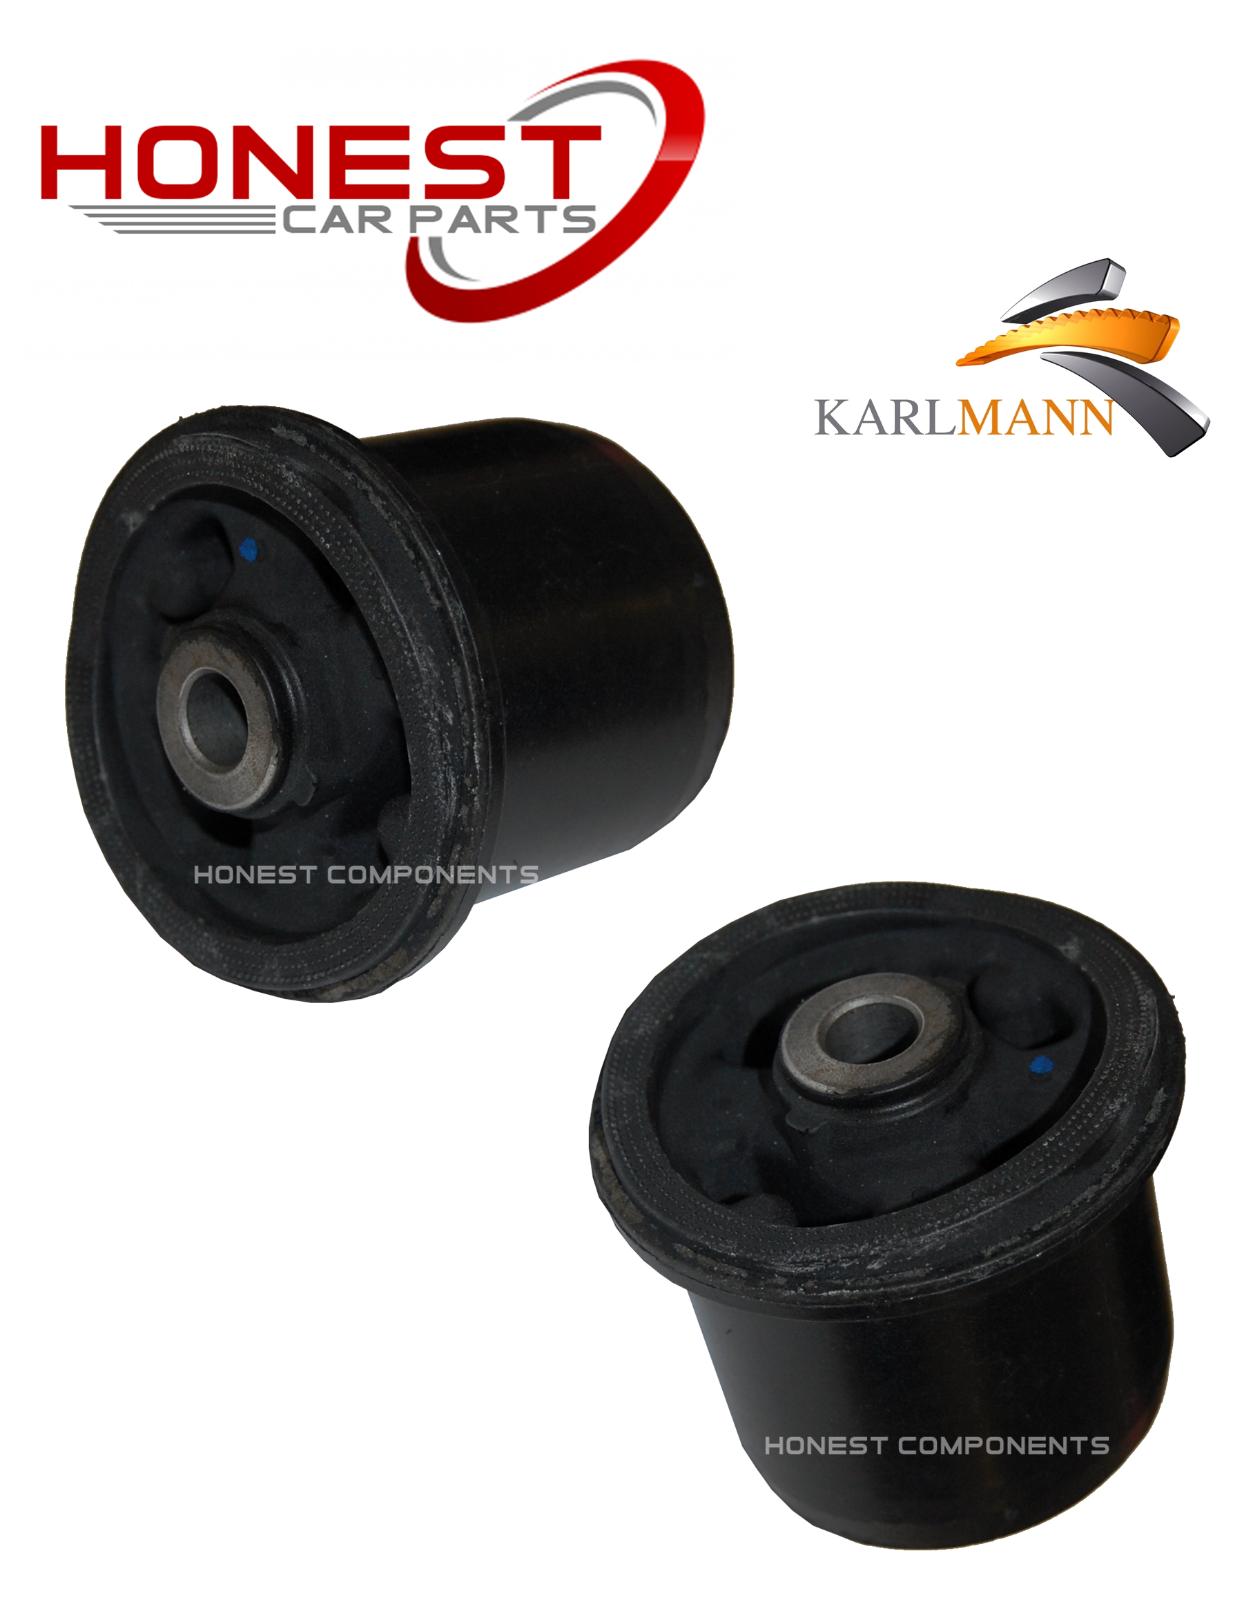 For NISSAN NOTE E11 2005-2012 REAR SUSPENSION AXLE MOUNTING BUSH X1 Karlmann